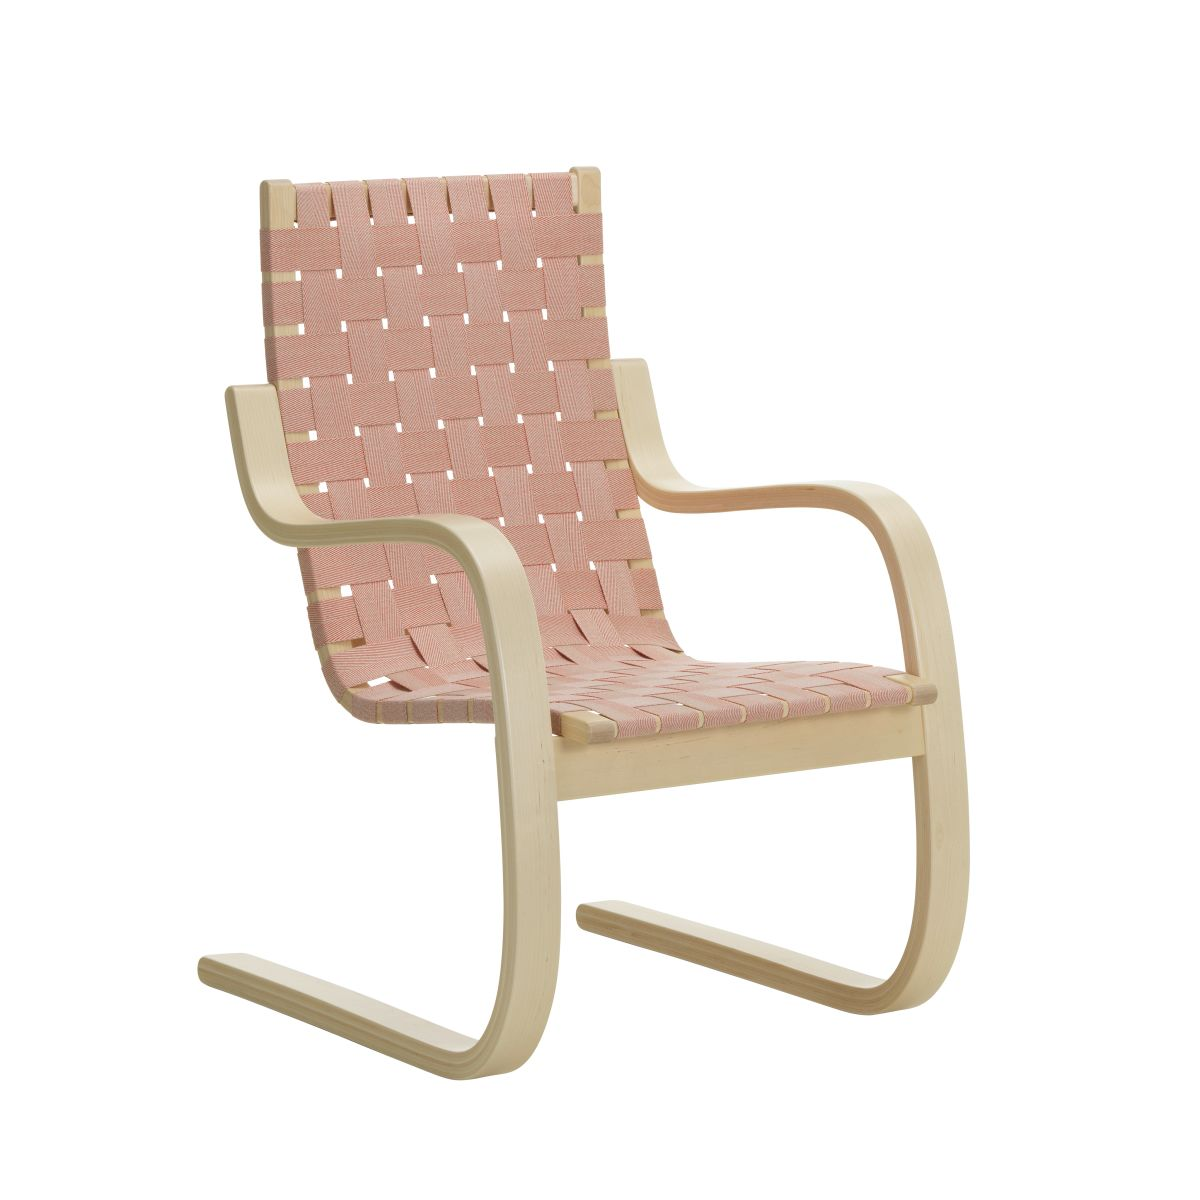 Armchair-406-natural-natural-red-webbing_F-2869198